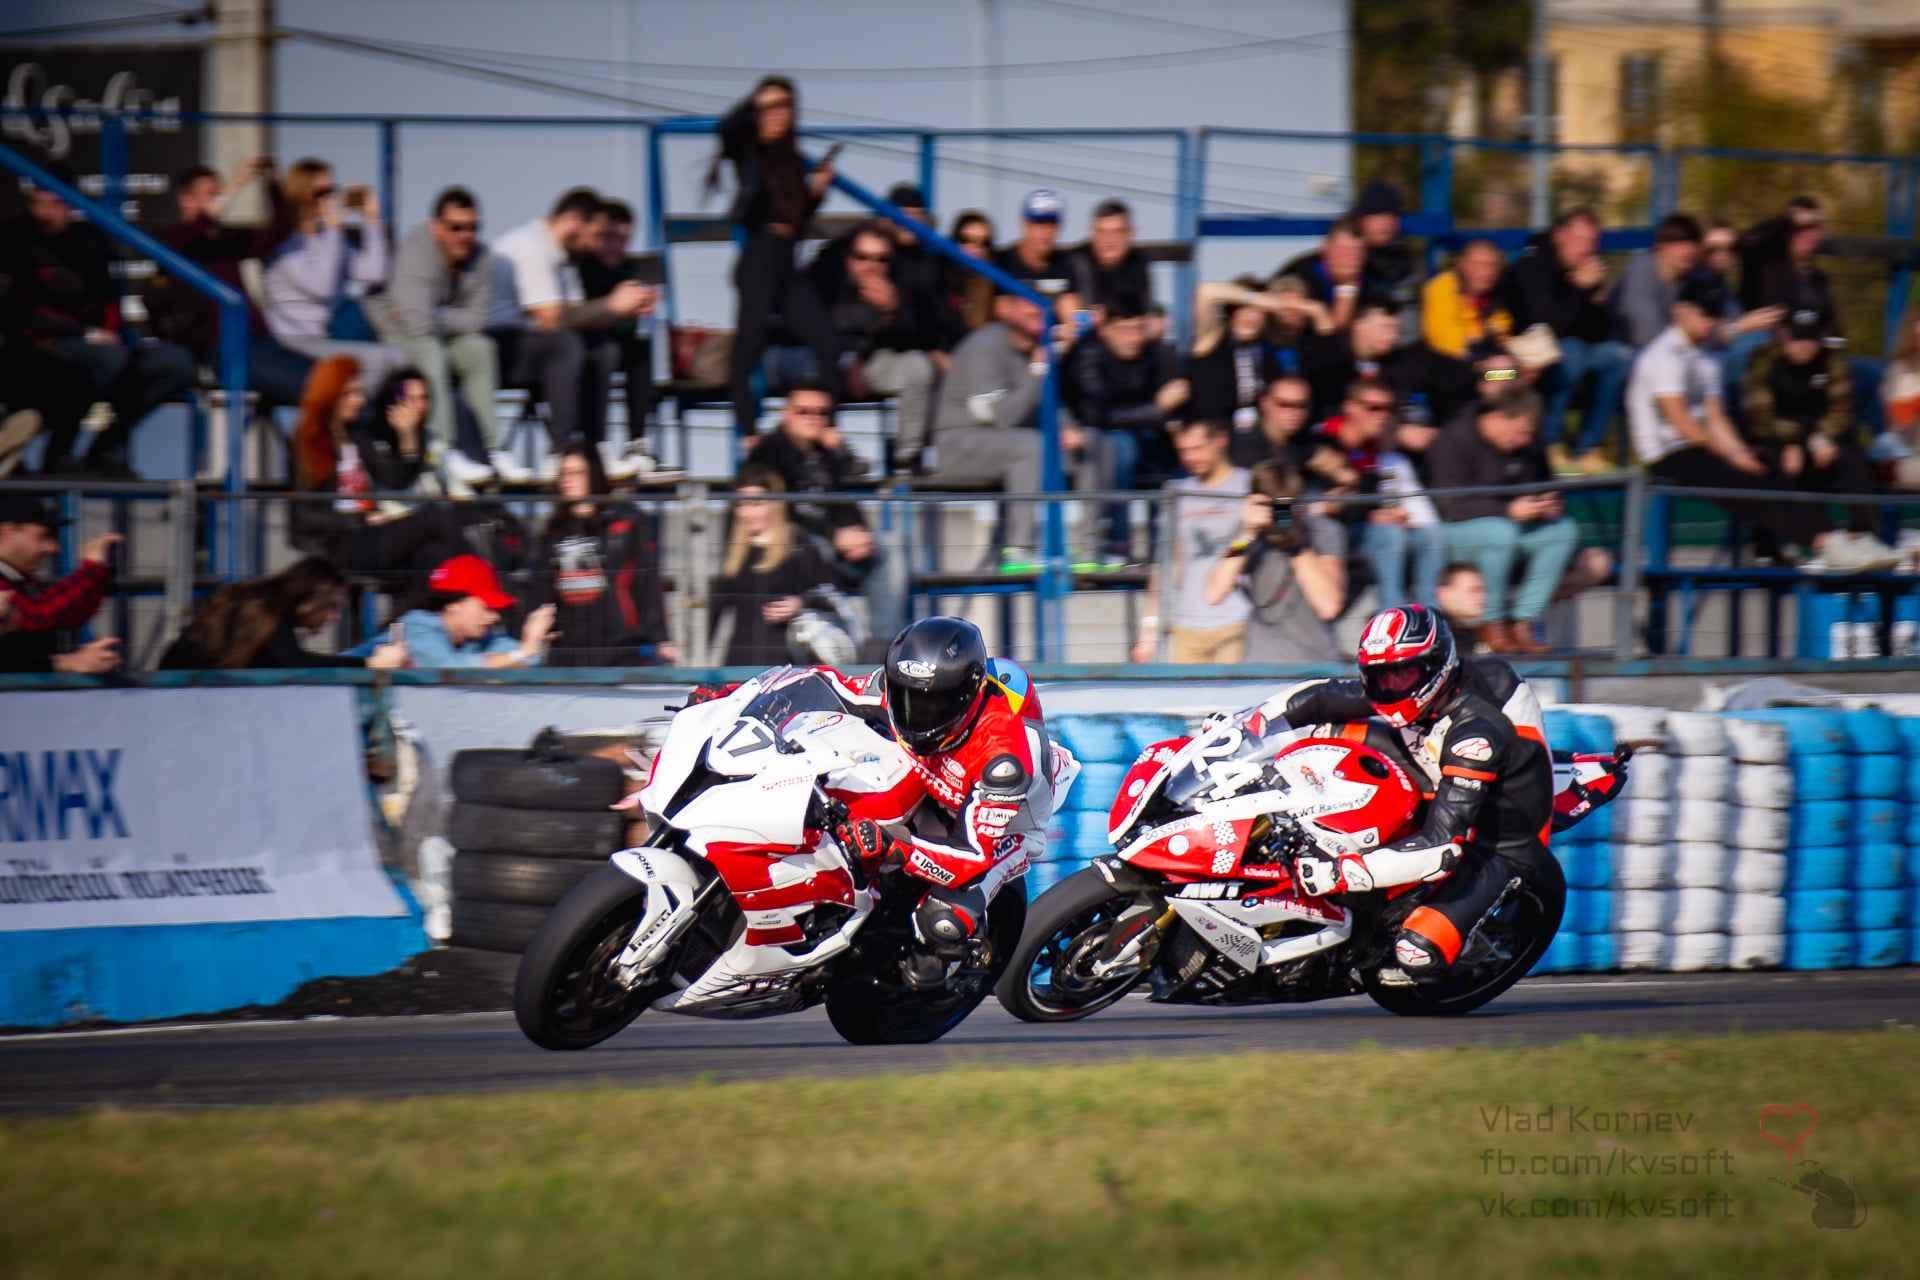 5-6_etap_MotoGPUkraine_151